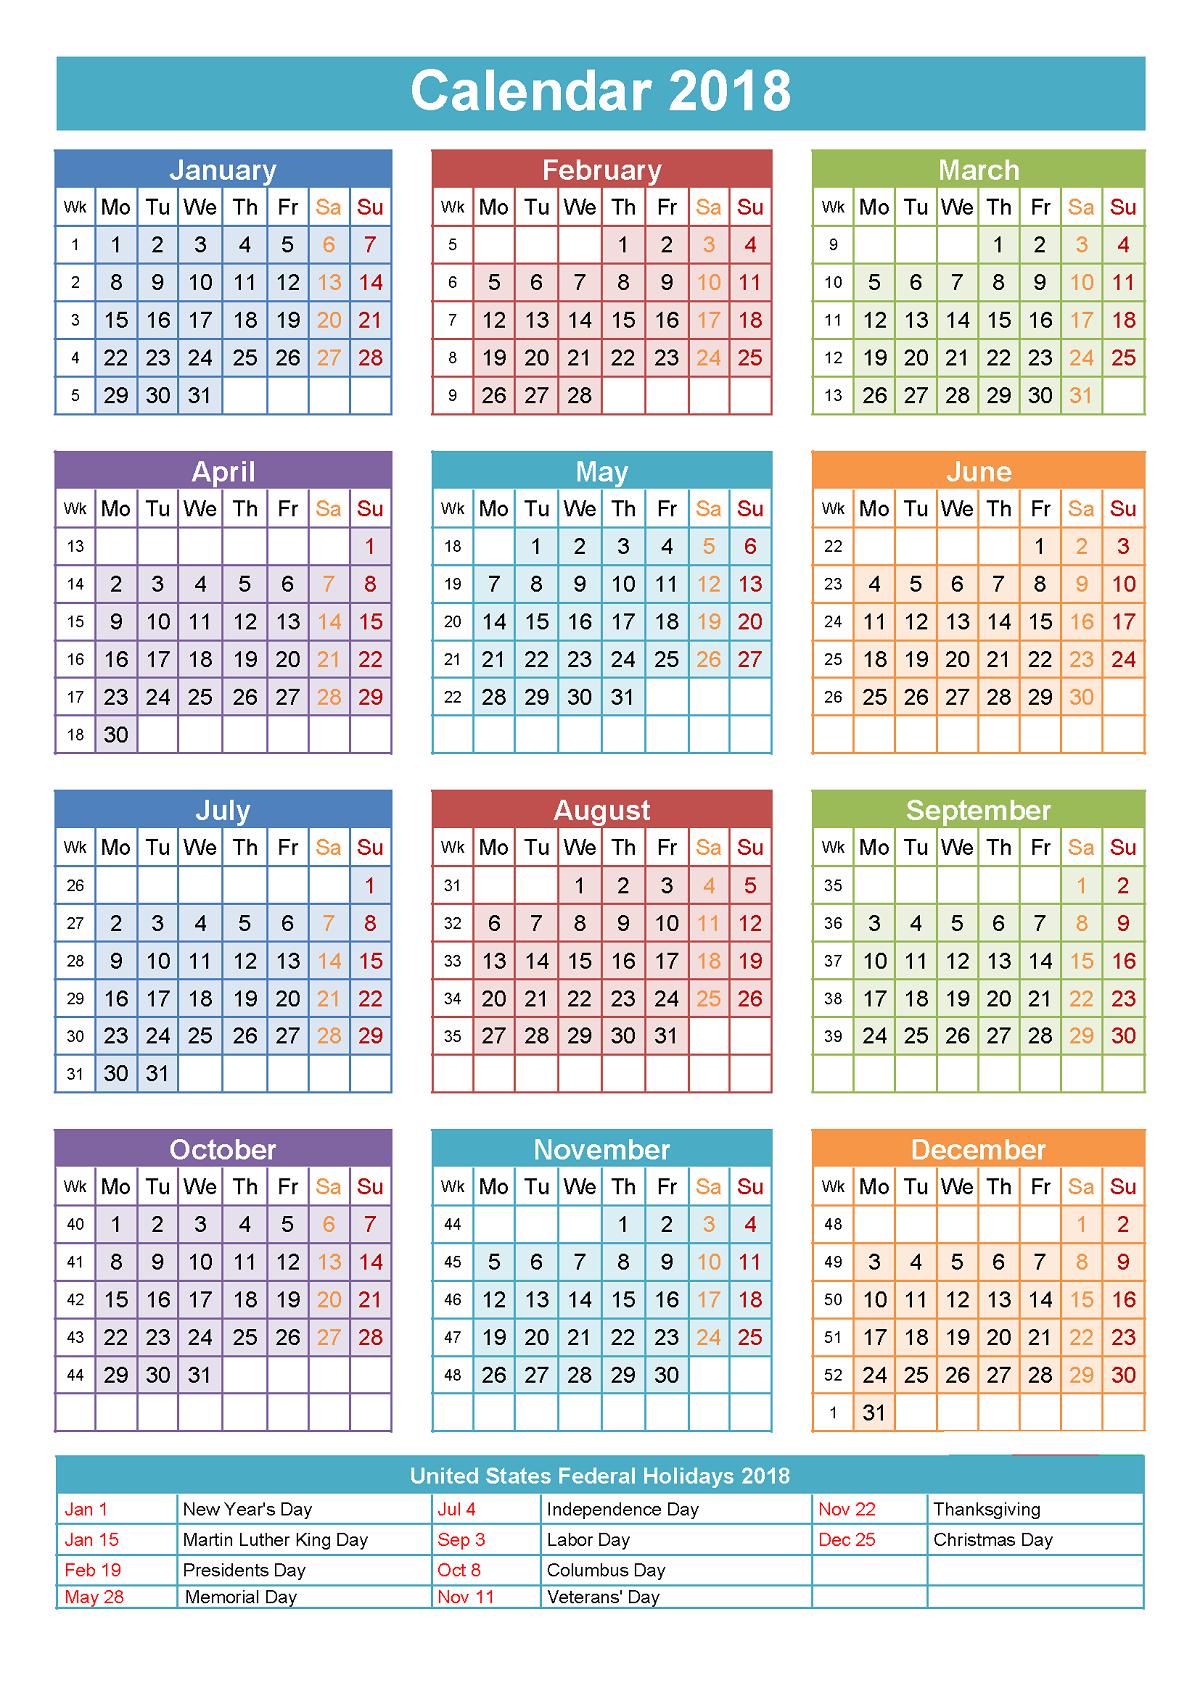 Free Calendars 2018 Printable Yearly Calendar Template Printable Yearly Calendar Calendar Printables